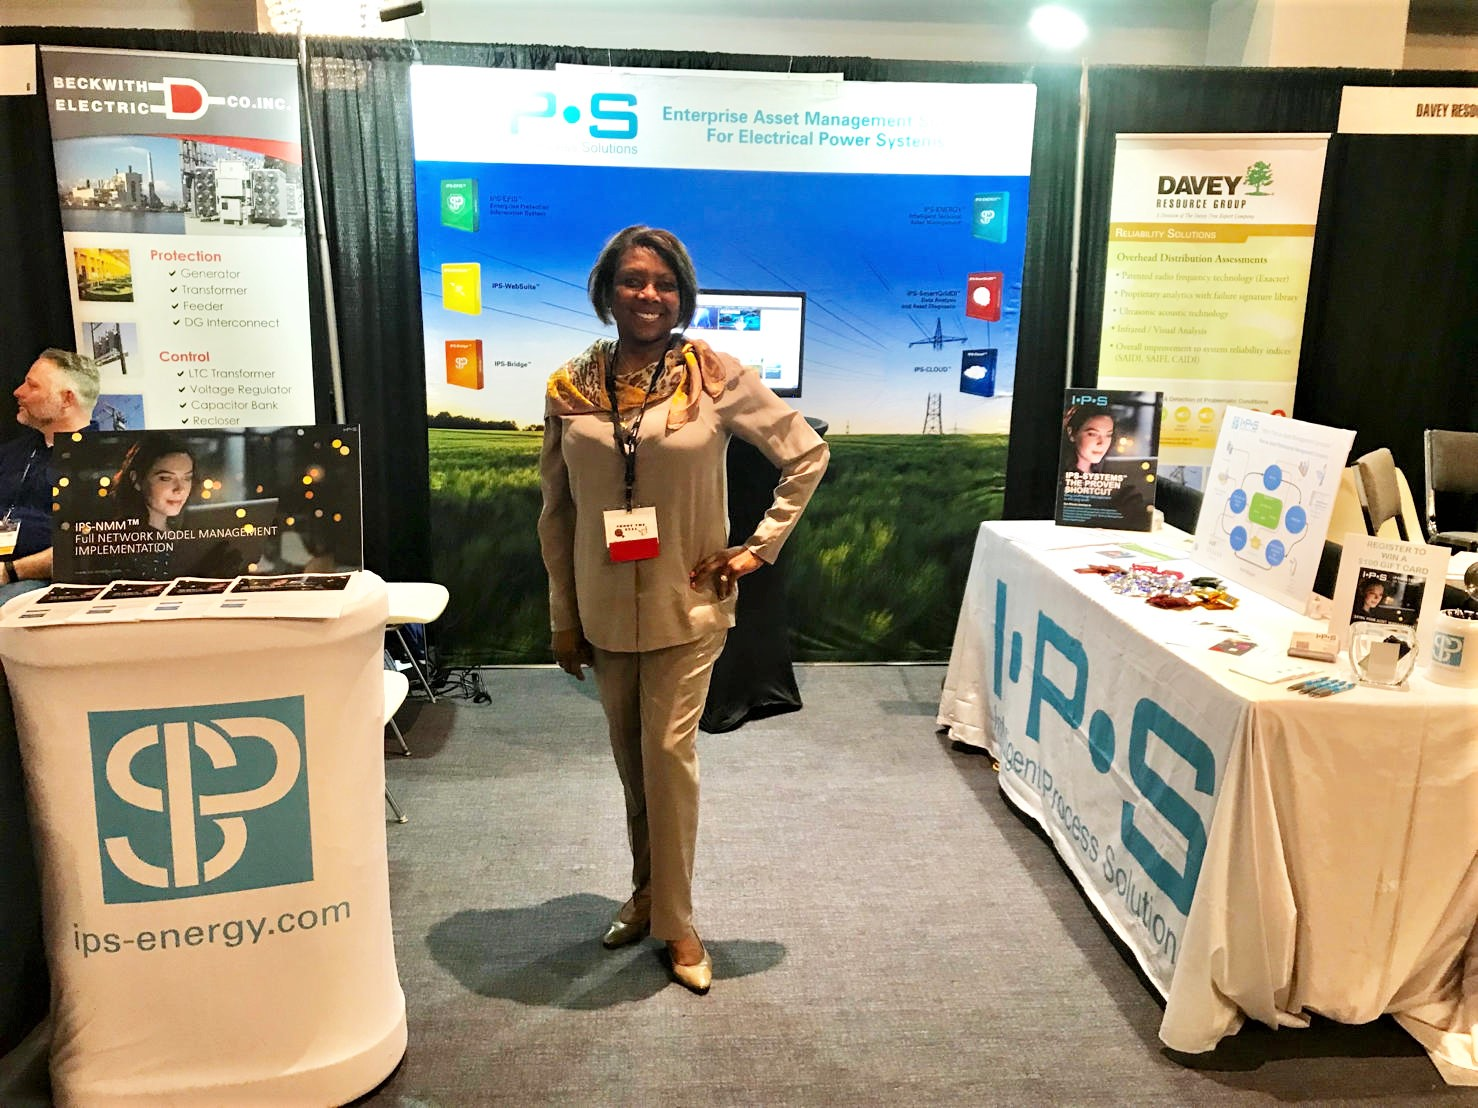 IEEE REPC 2019 Bloomington, Minnesota, USA